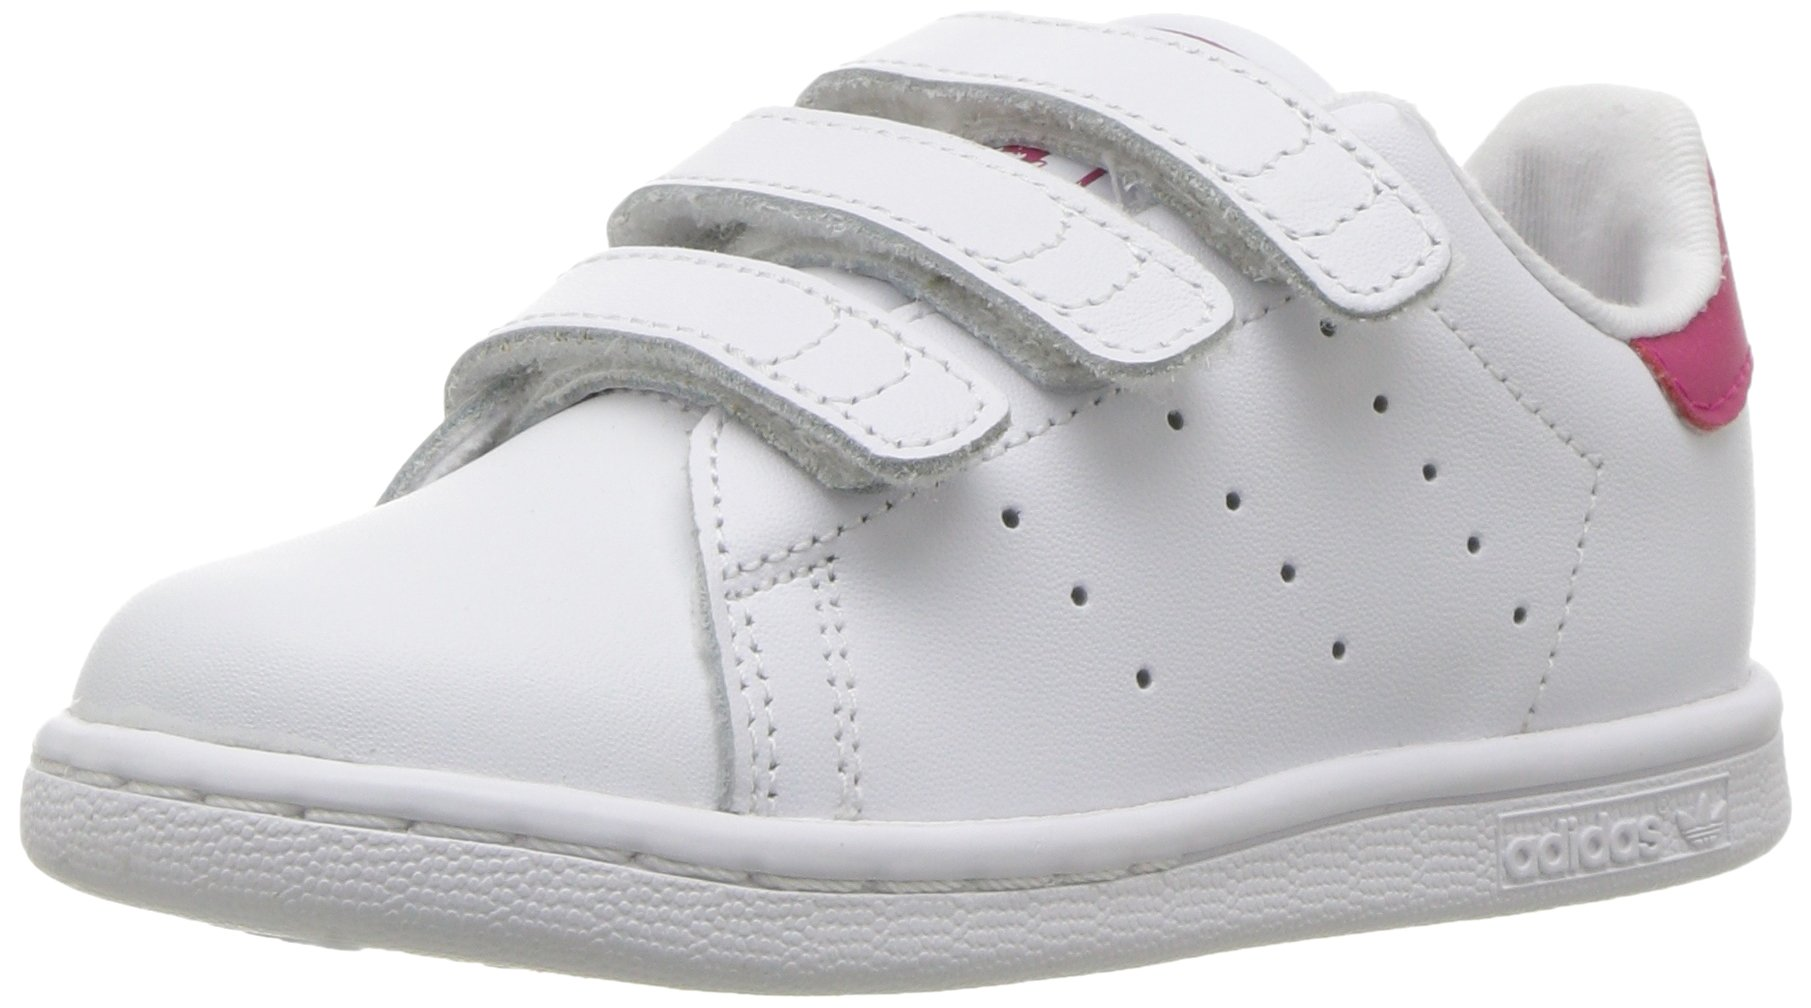 adidas Originals Girls' Stan Smith CF I Sneaker, White/White/Bold Pink, 8.5 M US Infant